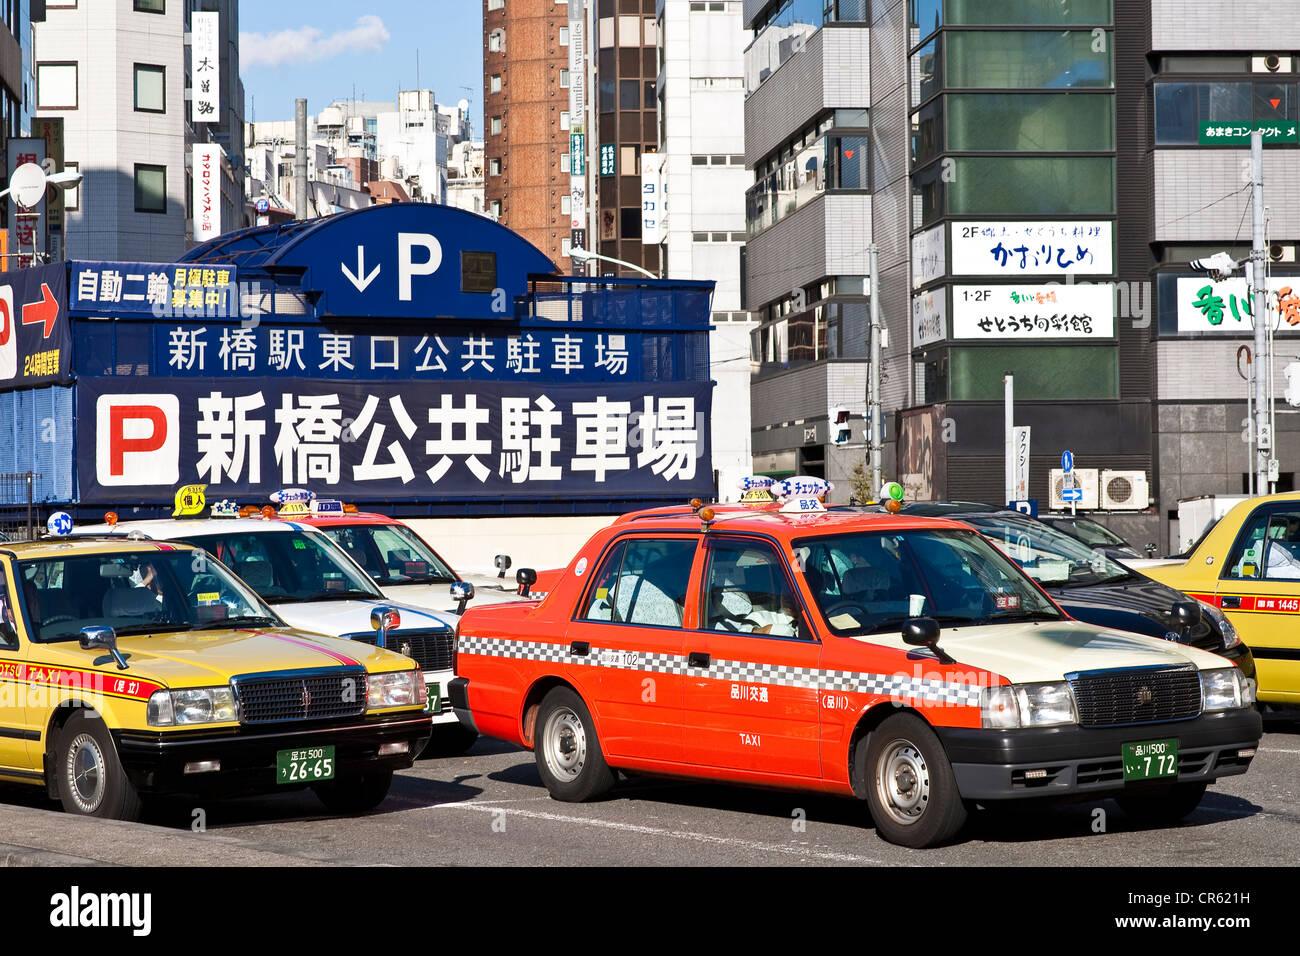 Japan, Honshu Island, Tokyo, Minato, Shimbashi Railway station, taxis station Stock Photo